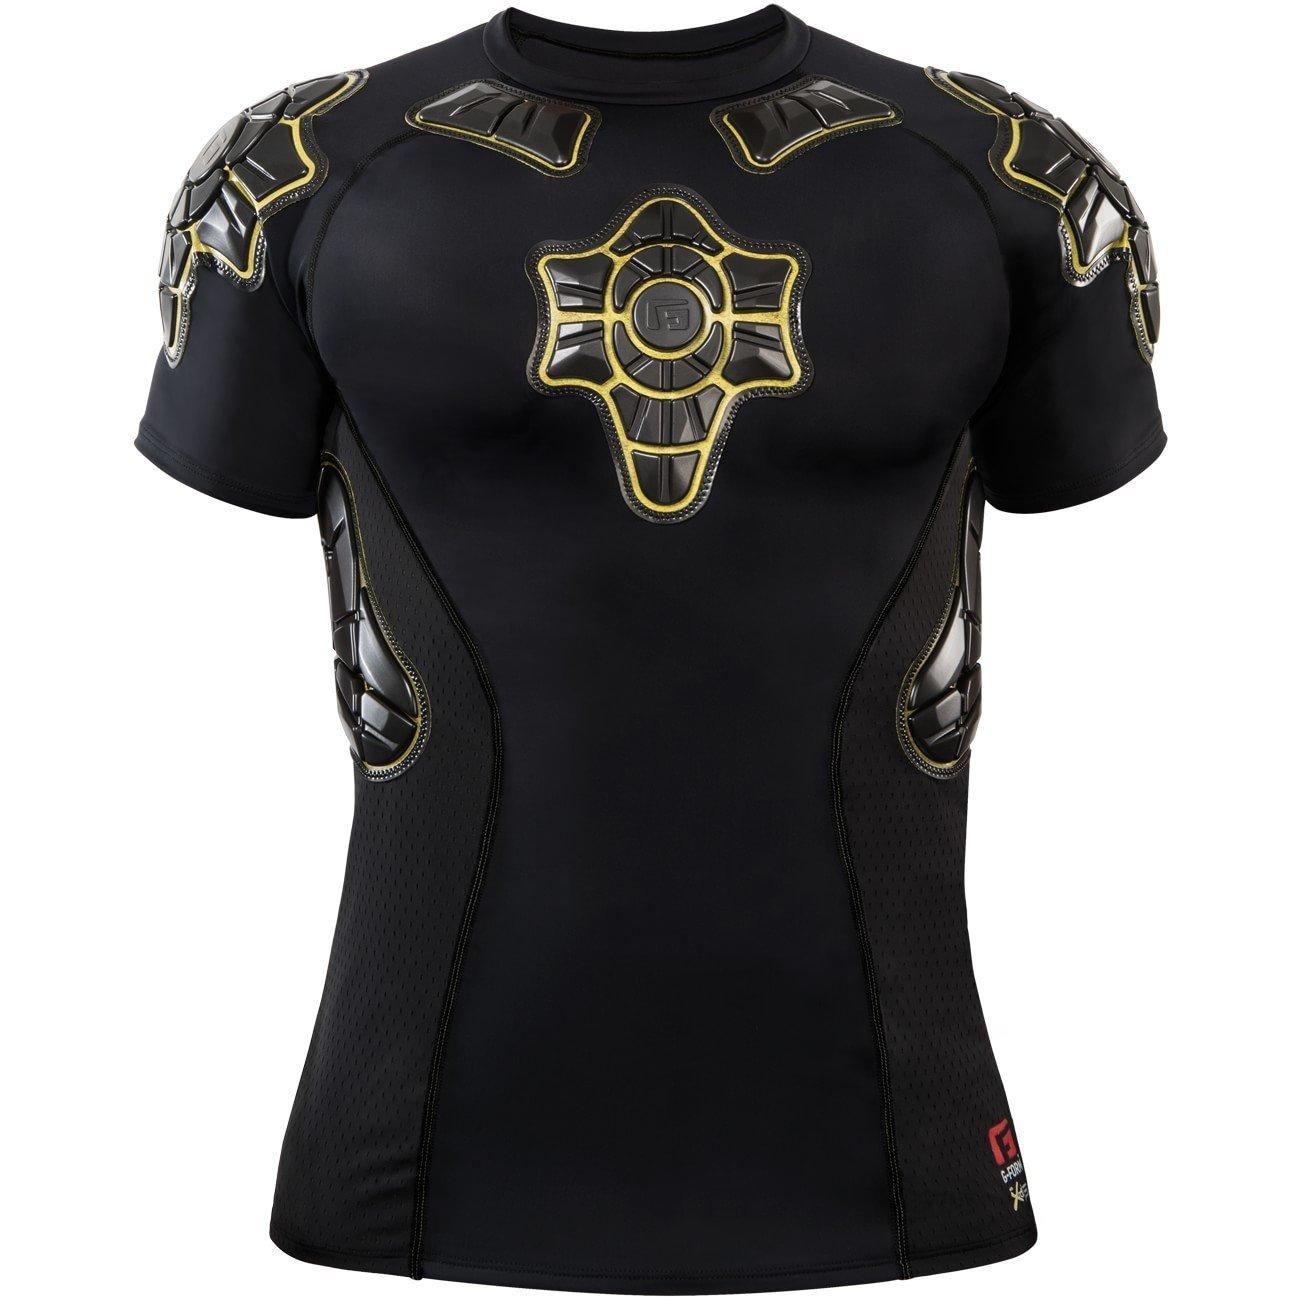 G-Form Youth Pro-X Short Sleeve Compression Shirt, Black, Medium